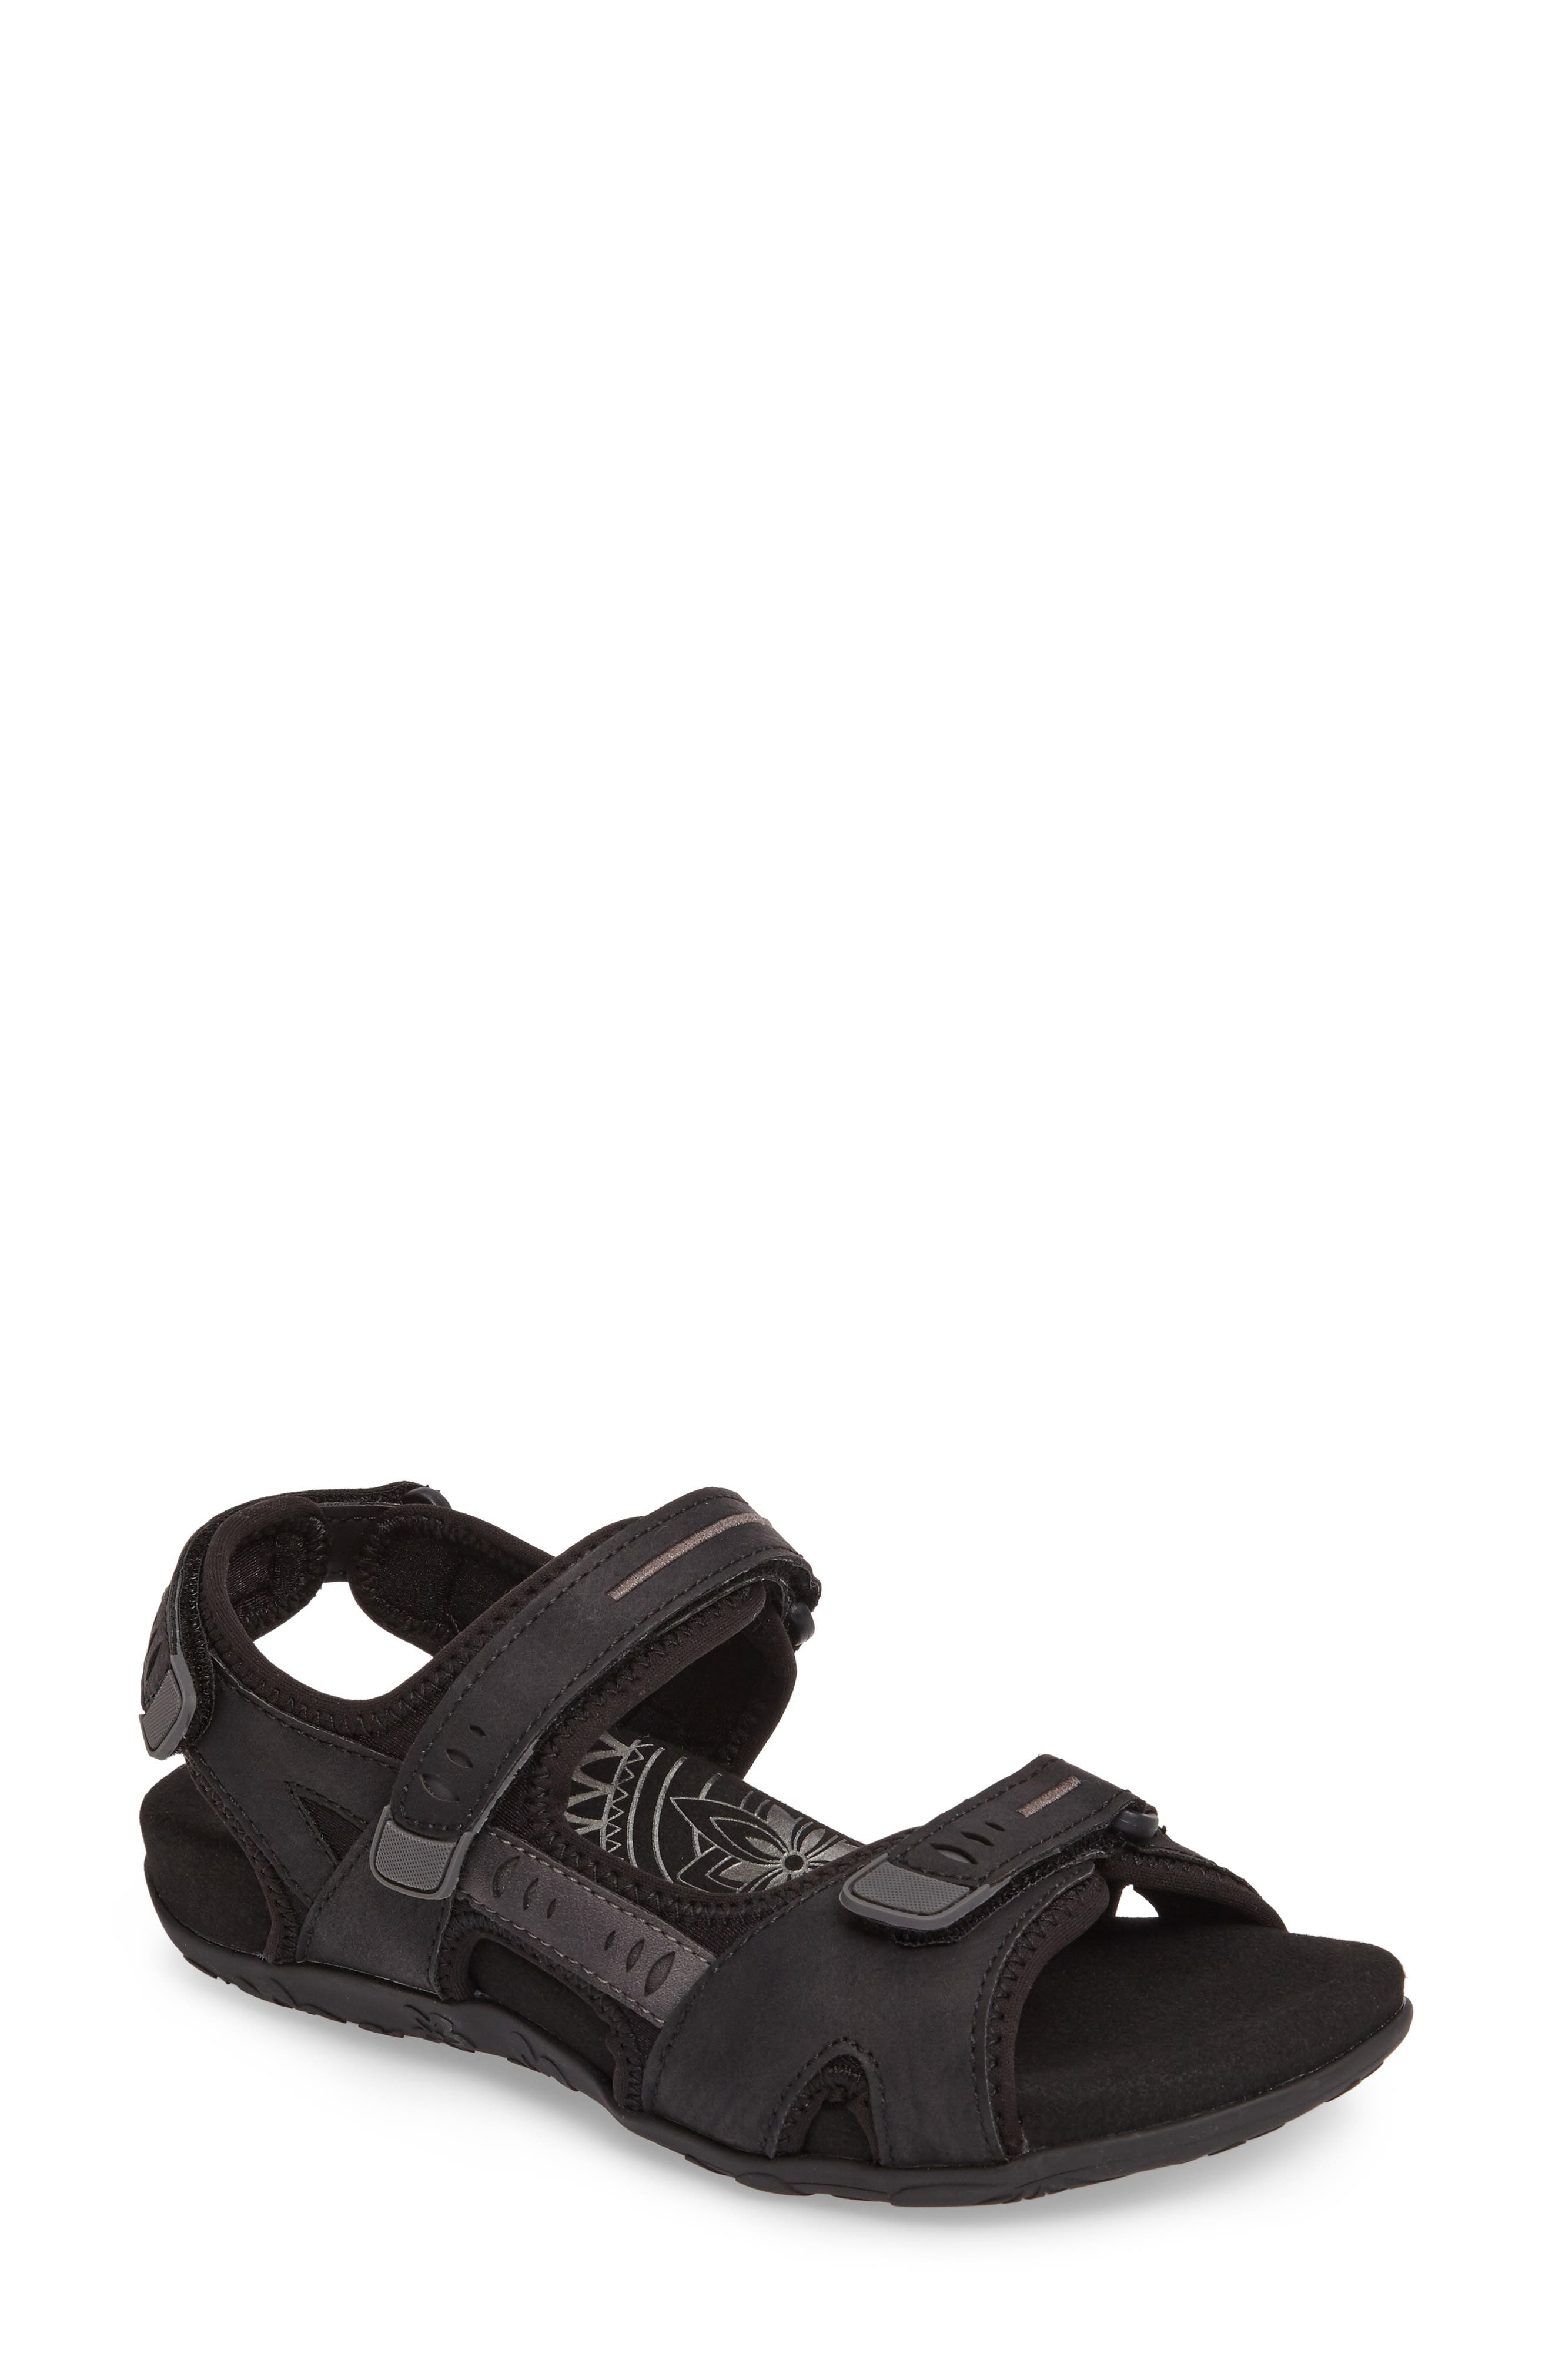 AETREX Bree Sport Sandal